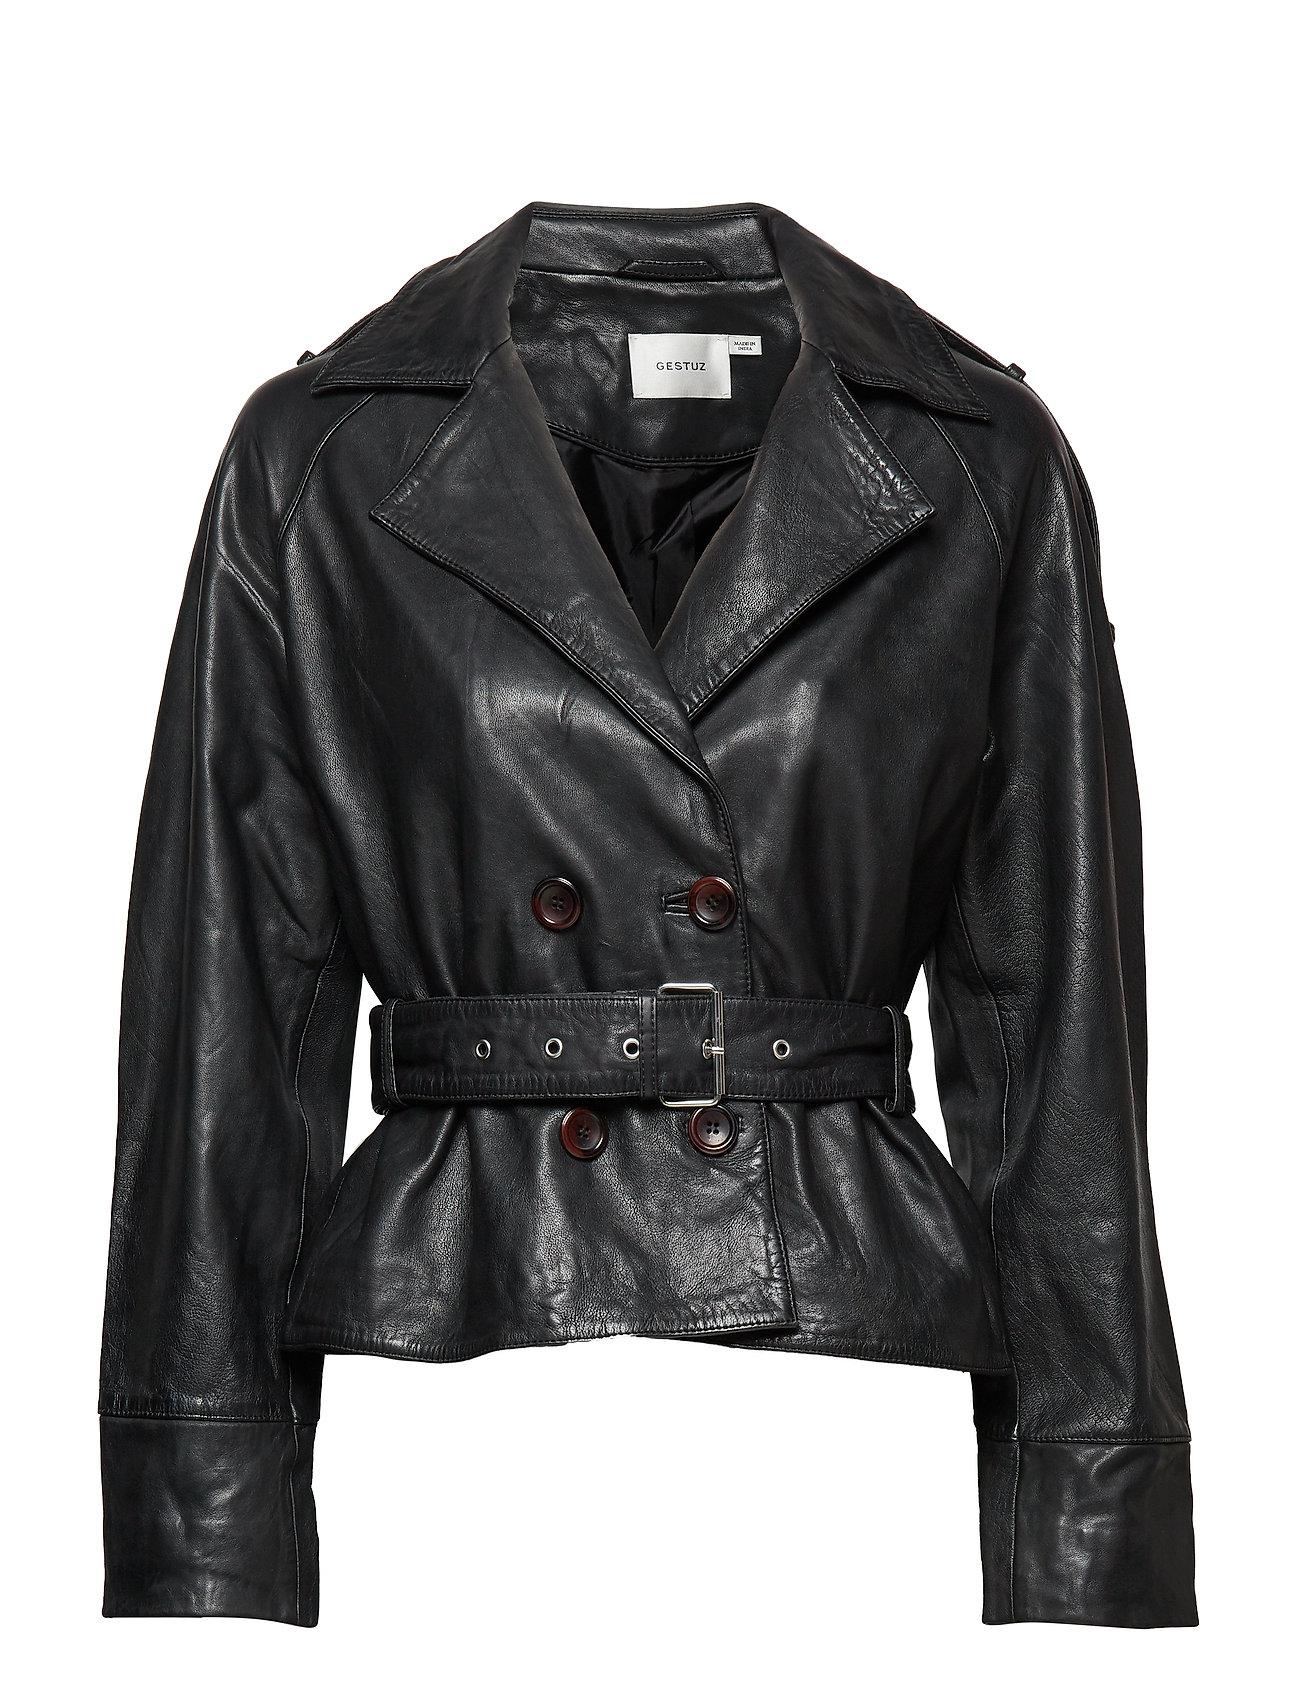 Gestuz Volitta jacket MS19 Ethical leather Ytterkläder